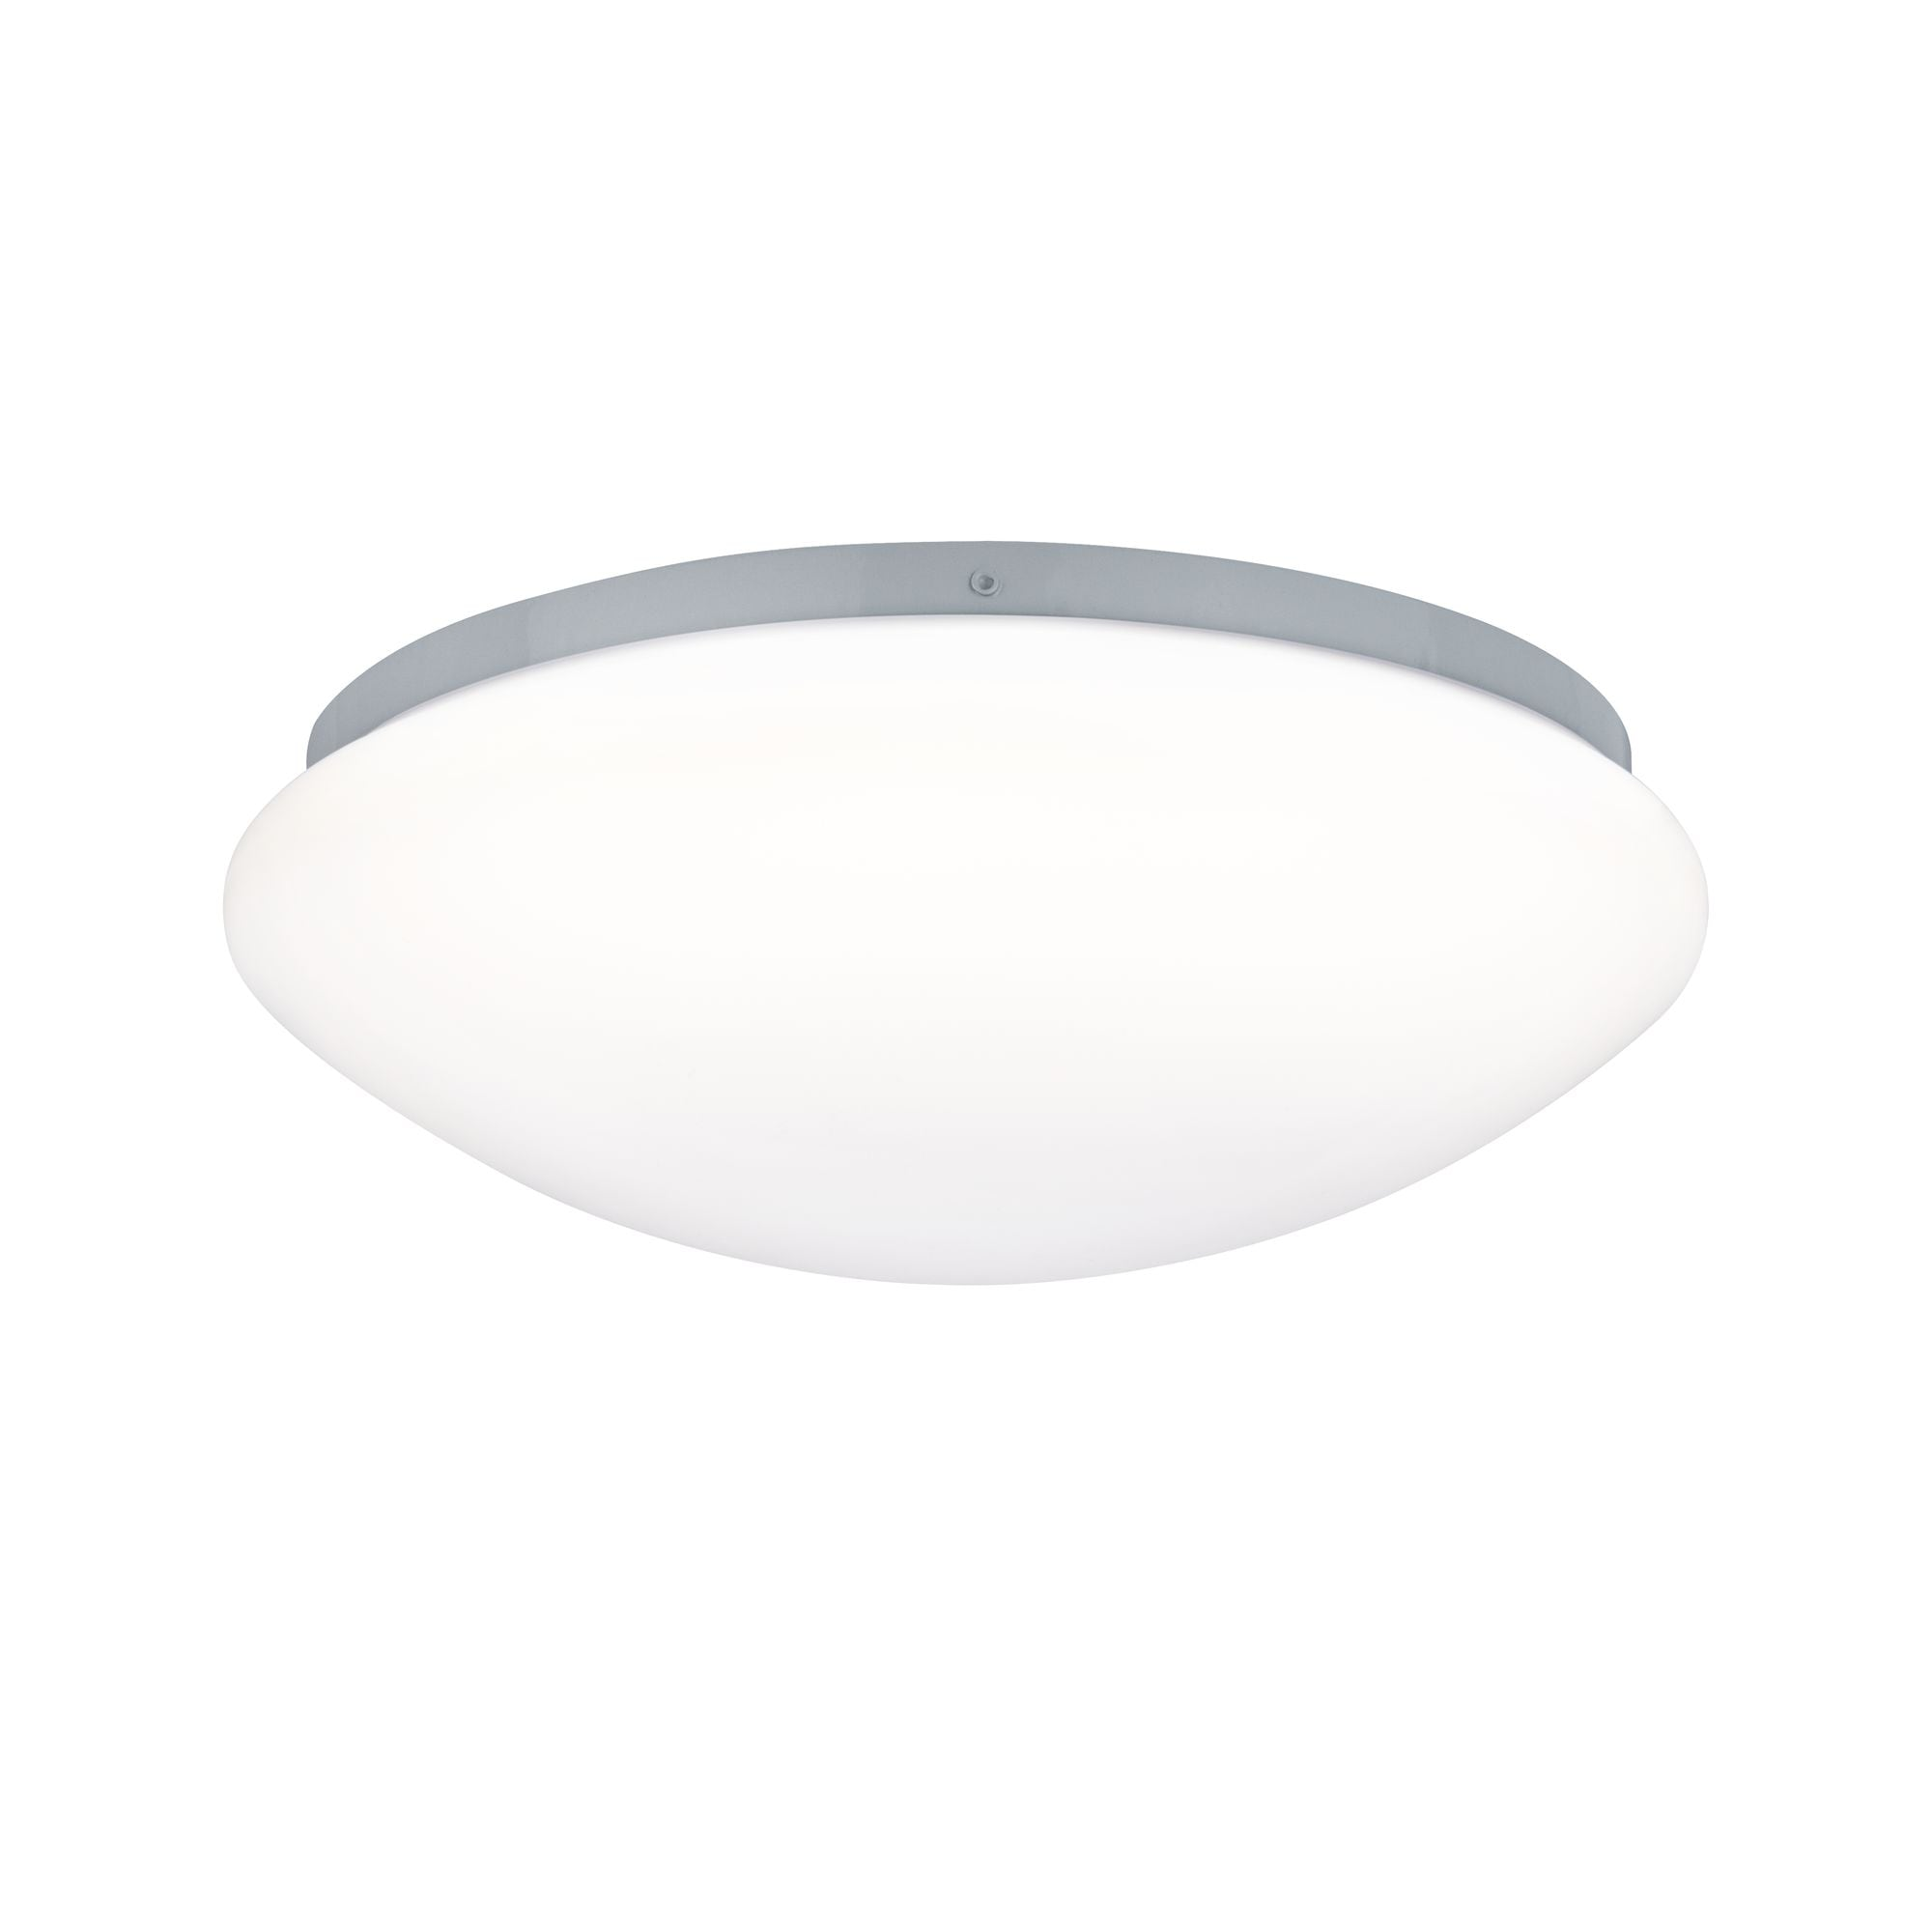 Paulmann,LED Deckenleuchte WallCeiling Leonis IP44 1W 4000K 230V Weiß Kunststoff